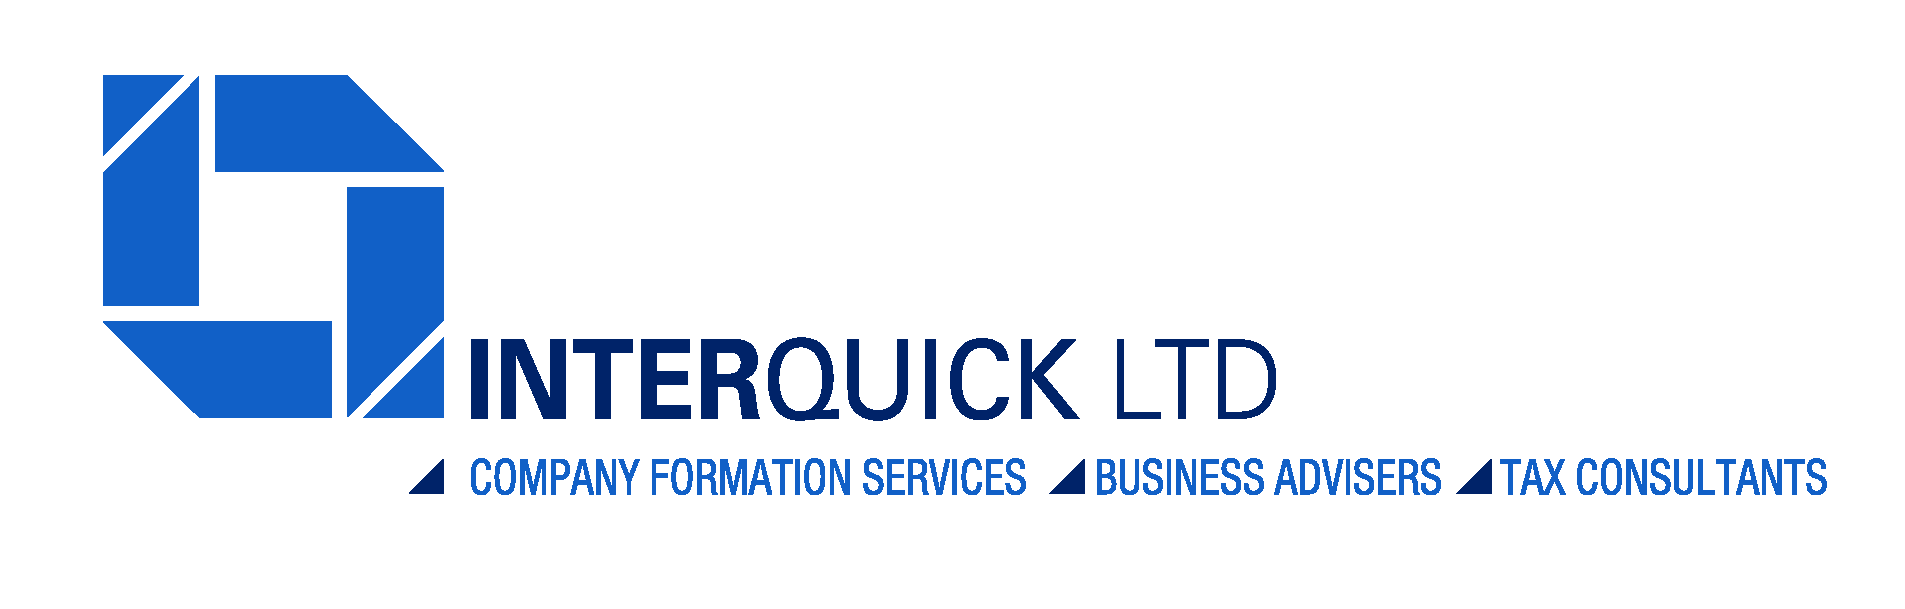 interquick